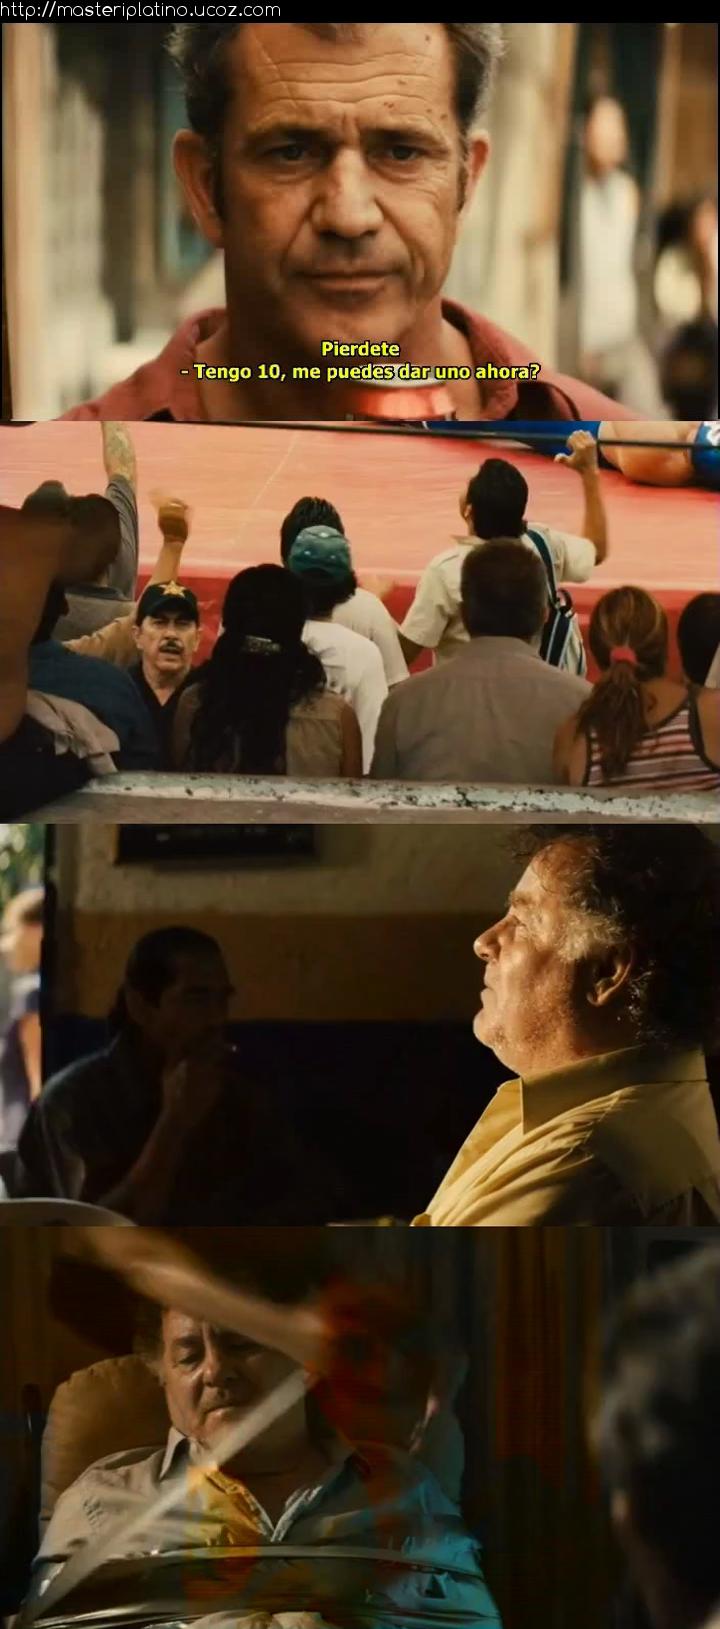 Atrapen al Gringo 2012 (HDTV) (Español Subtitulada) 1 link